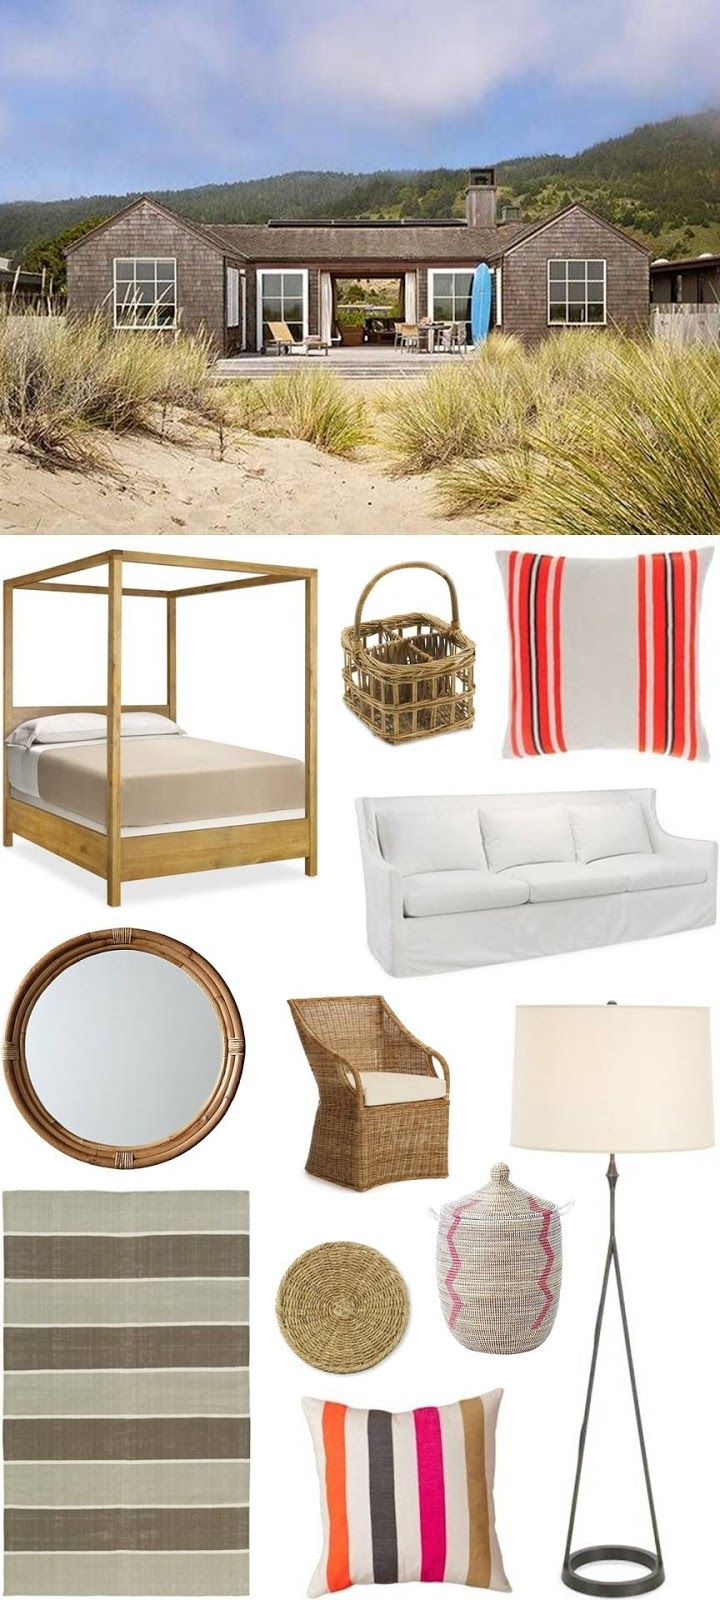 CHIC COASTAL LIVING: Beach House: Get The Look. Montara Mirror & Pink Senegalese Basket.